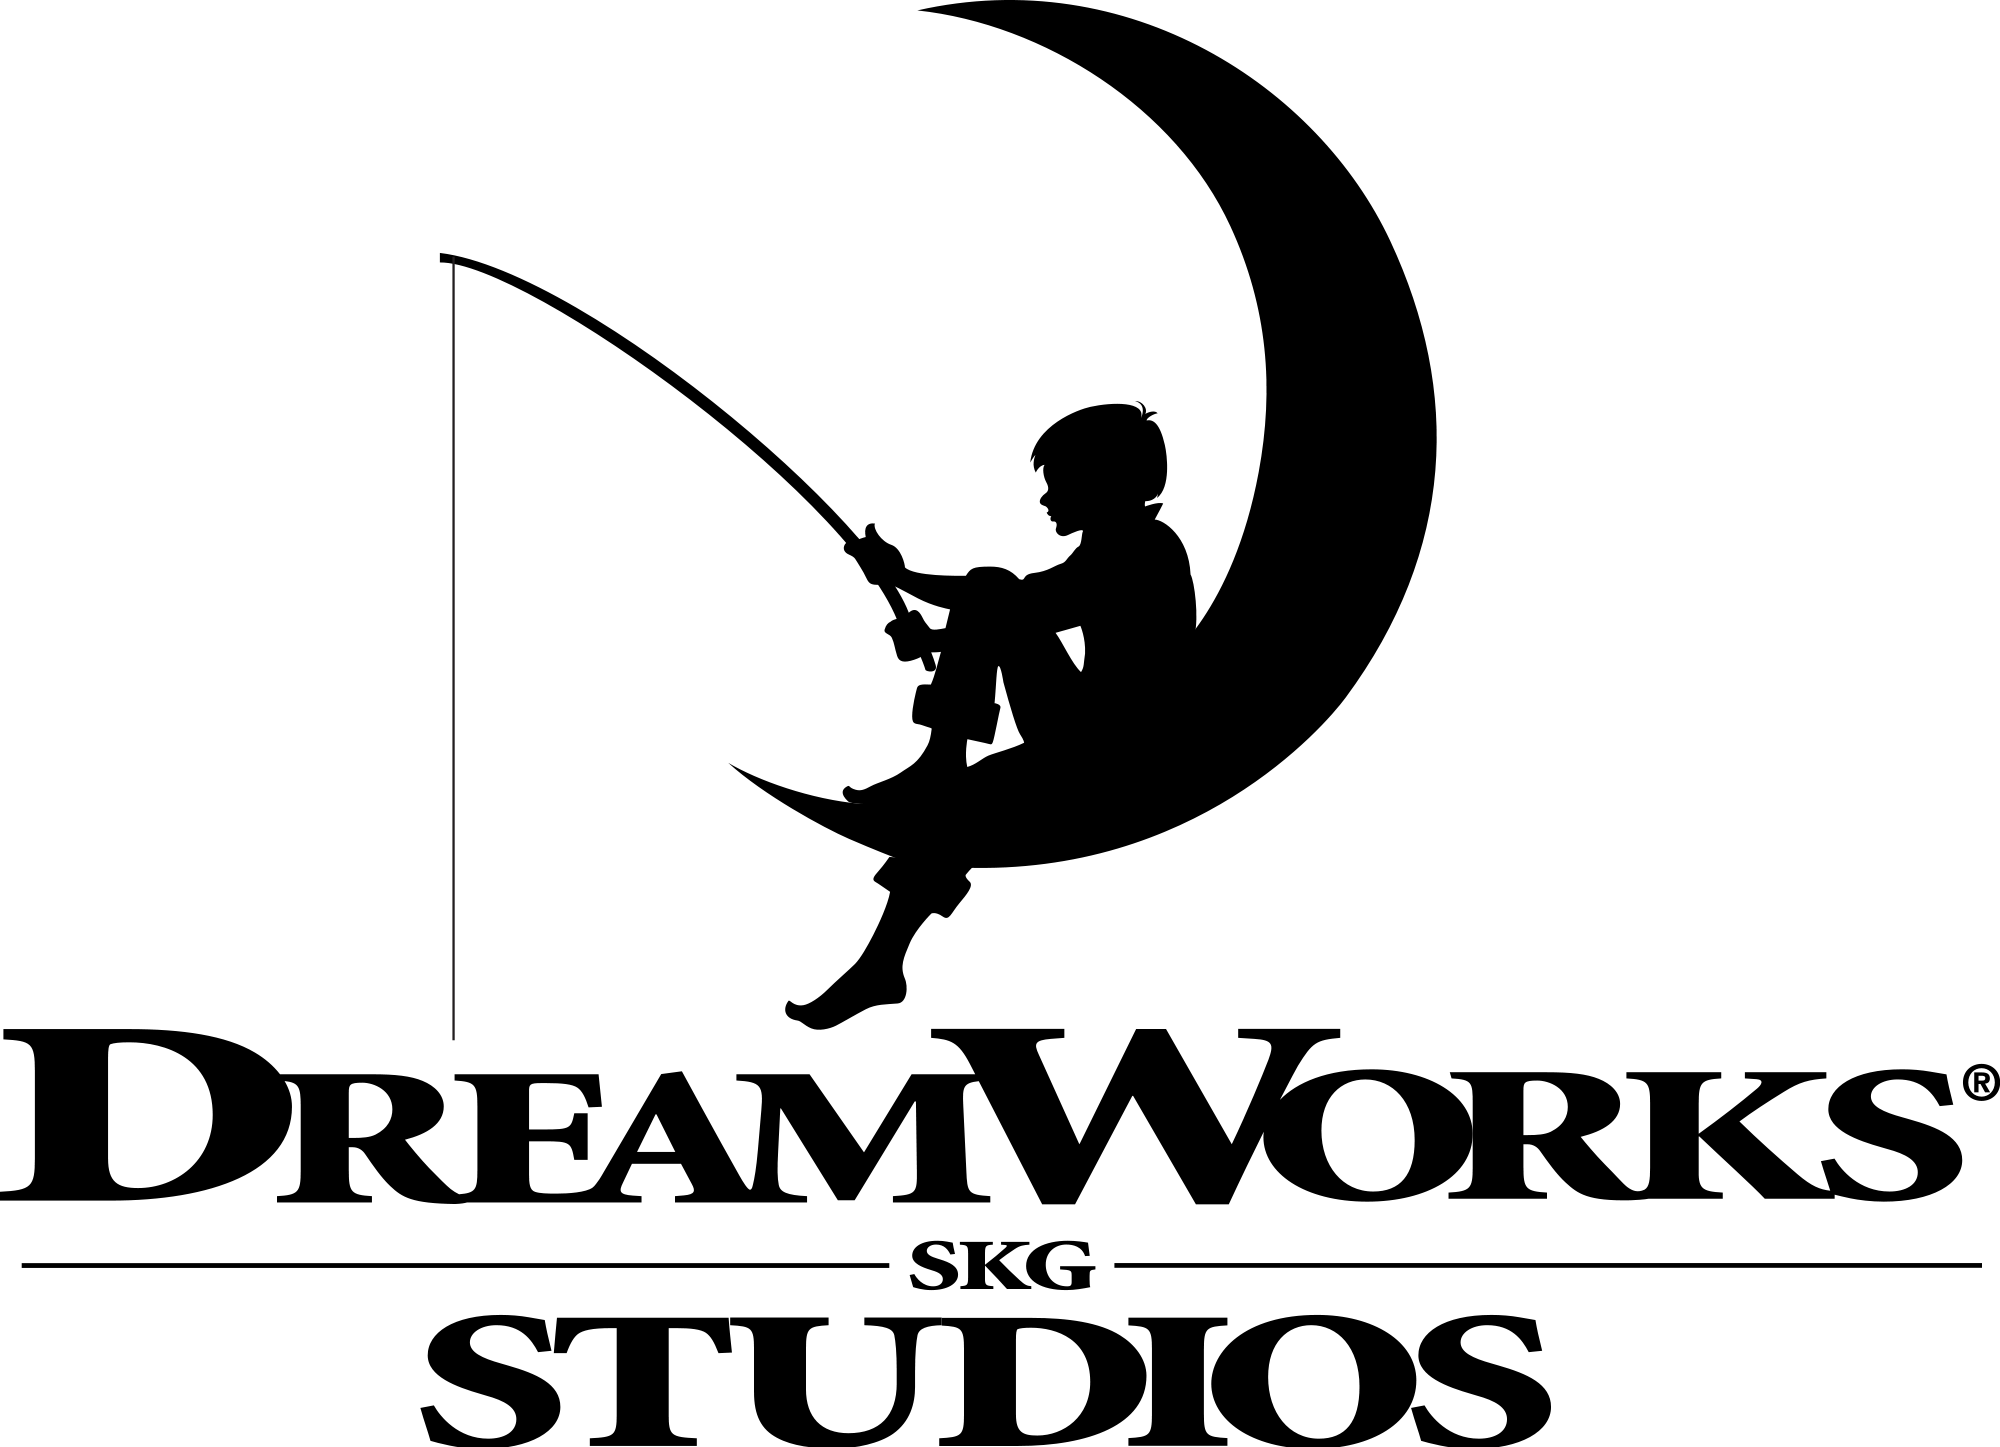 2000px-DreamWorks_Studios_logo_svg